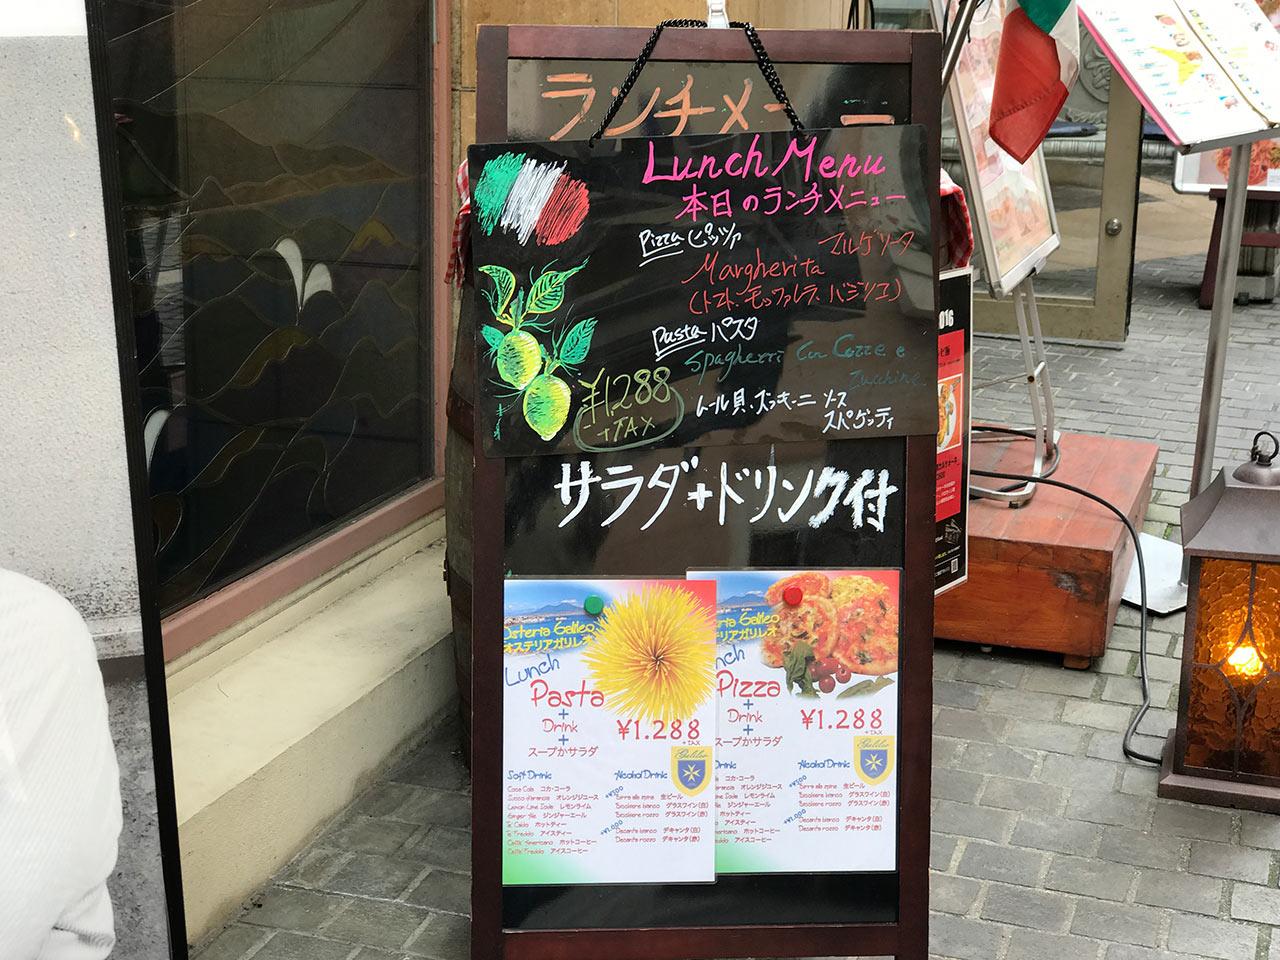 kawasaki-osteria-galileo-menu